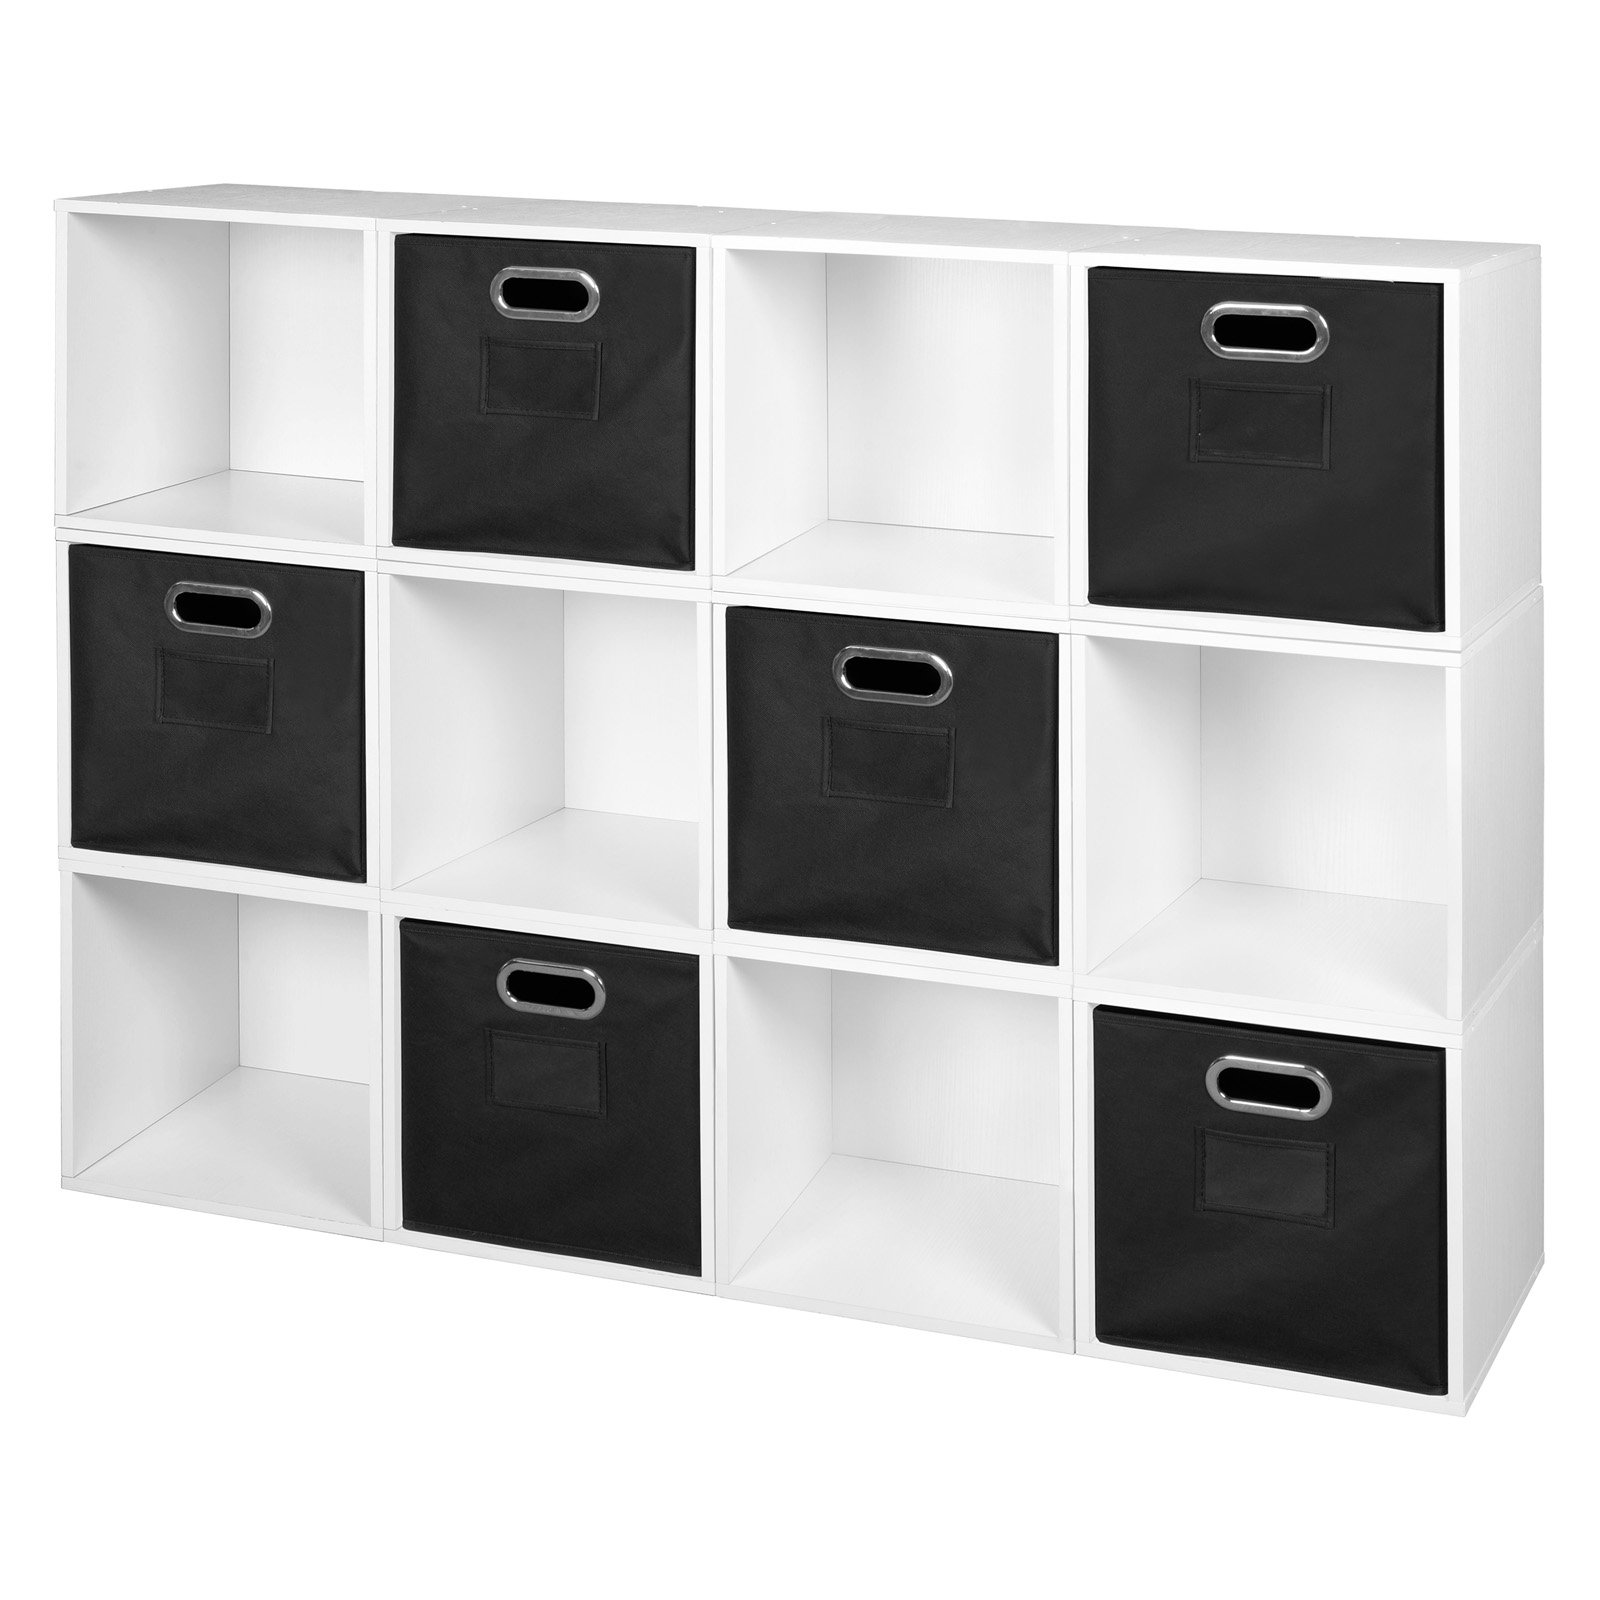 Niche Cubo Storage Set - 12 Cubes and 6 Canvas Bins